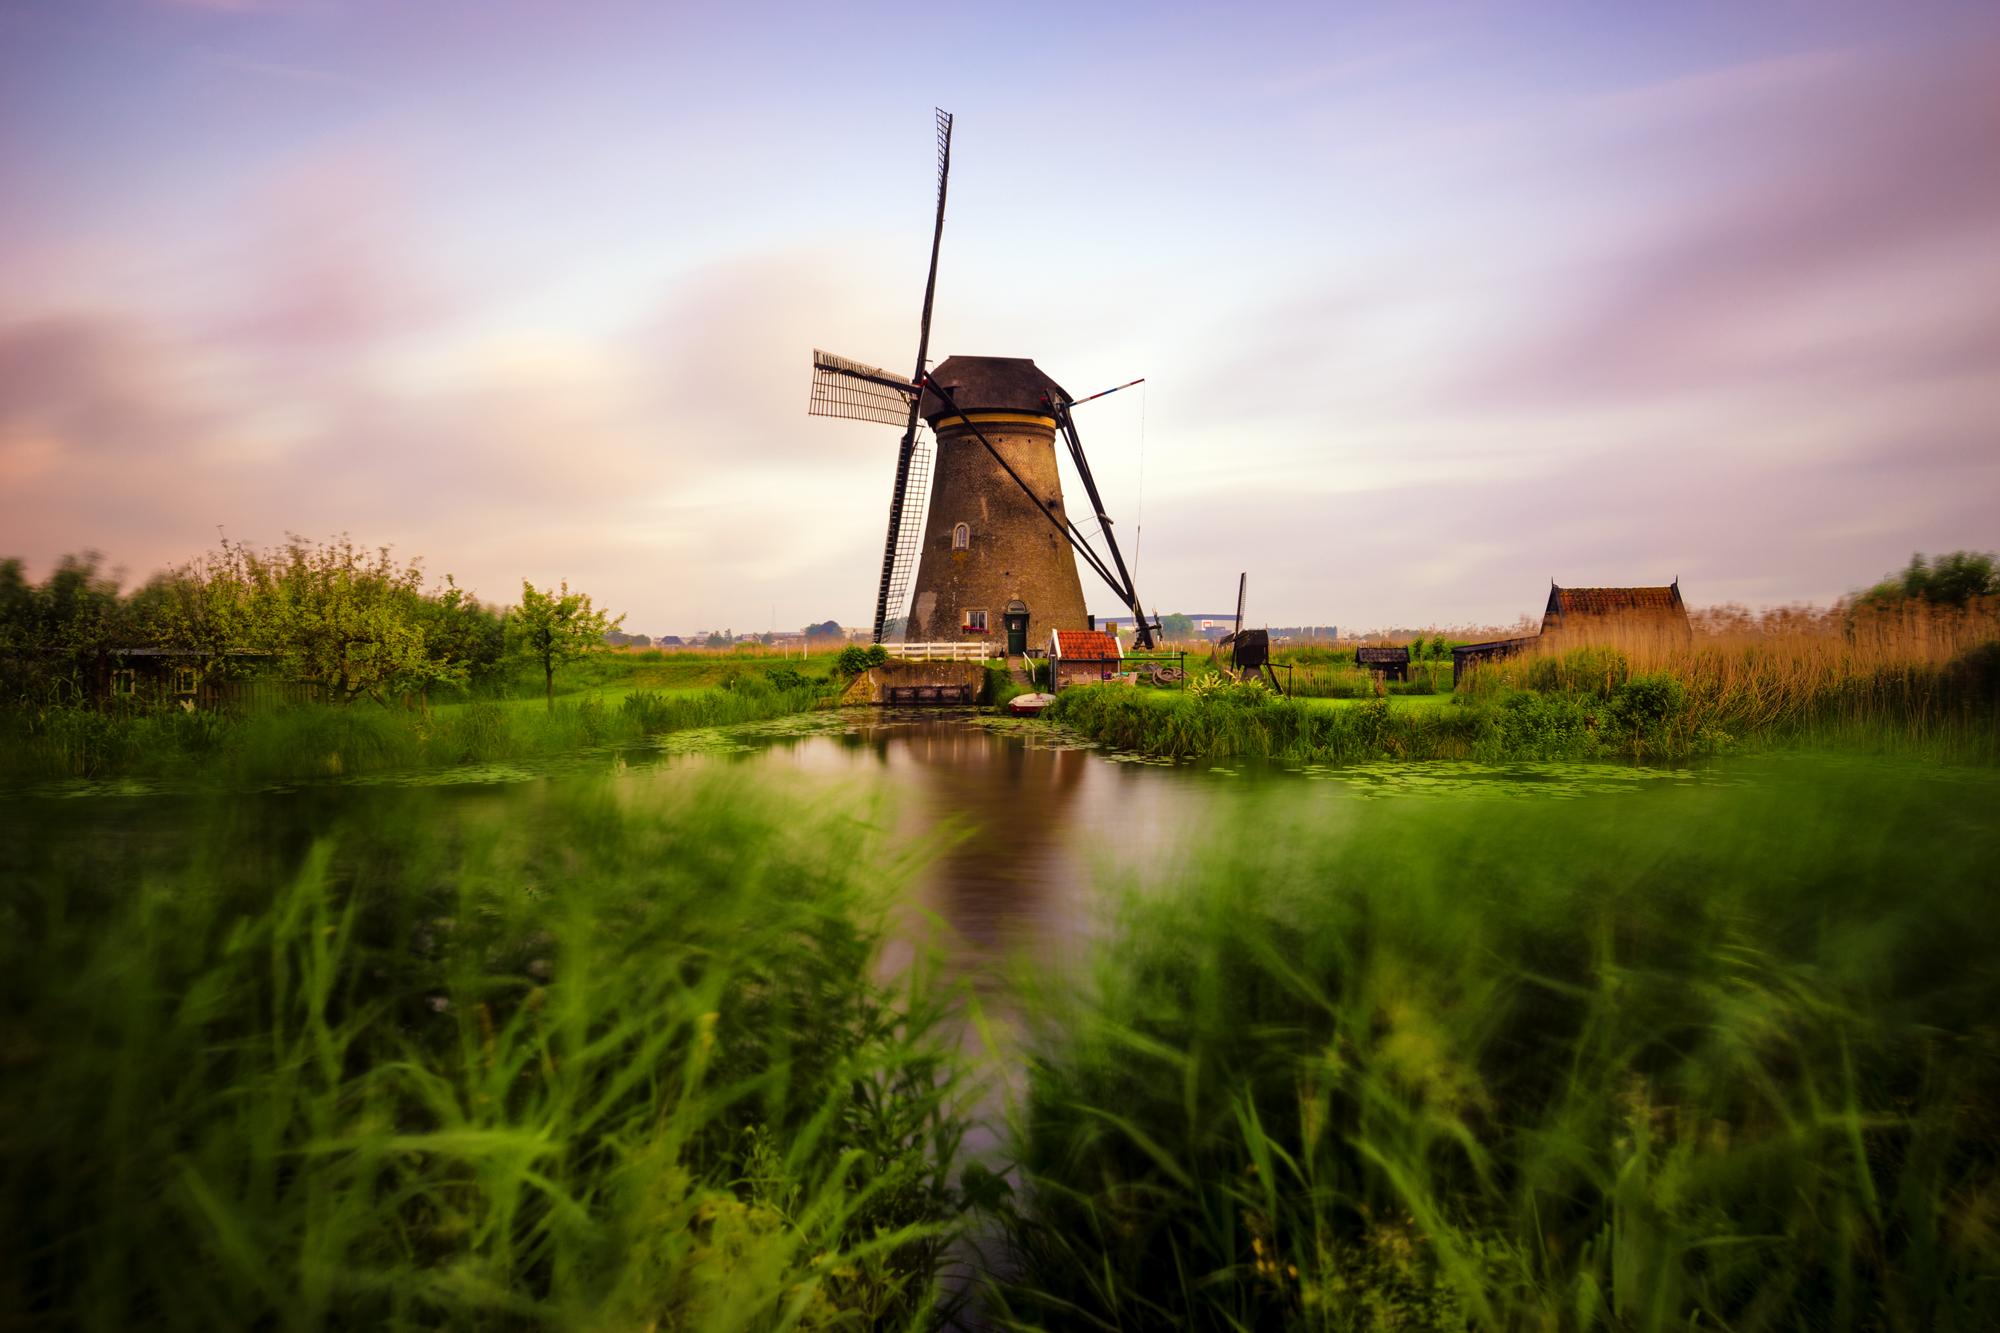 Windmills of Kinderdijk | Rotterdam, South Holland